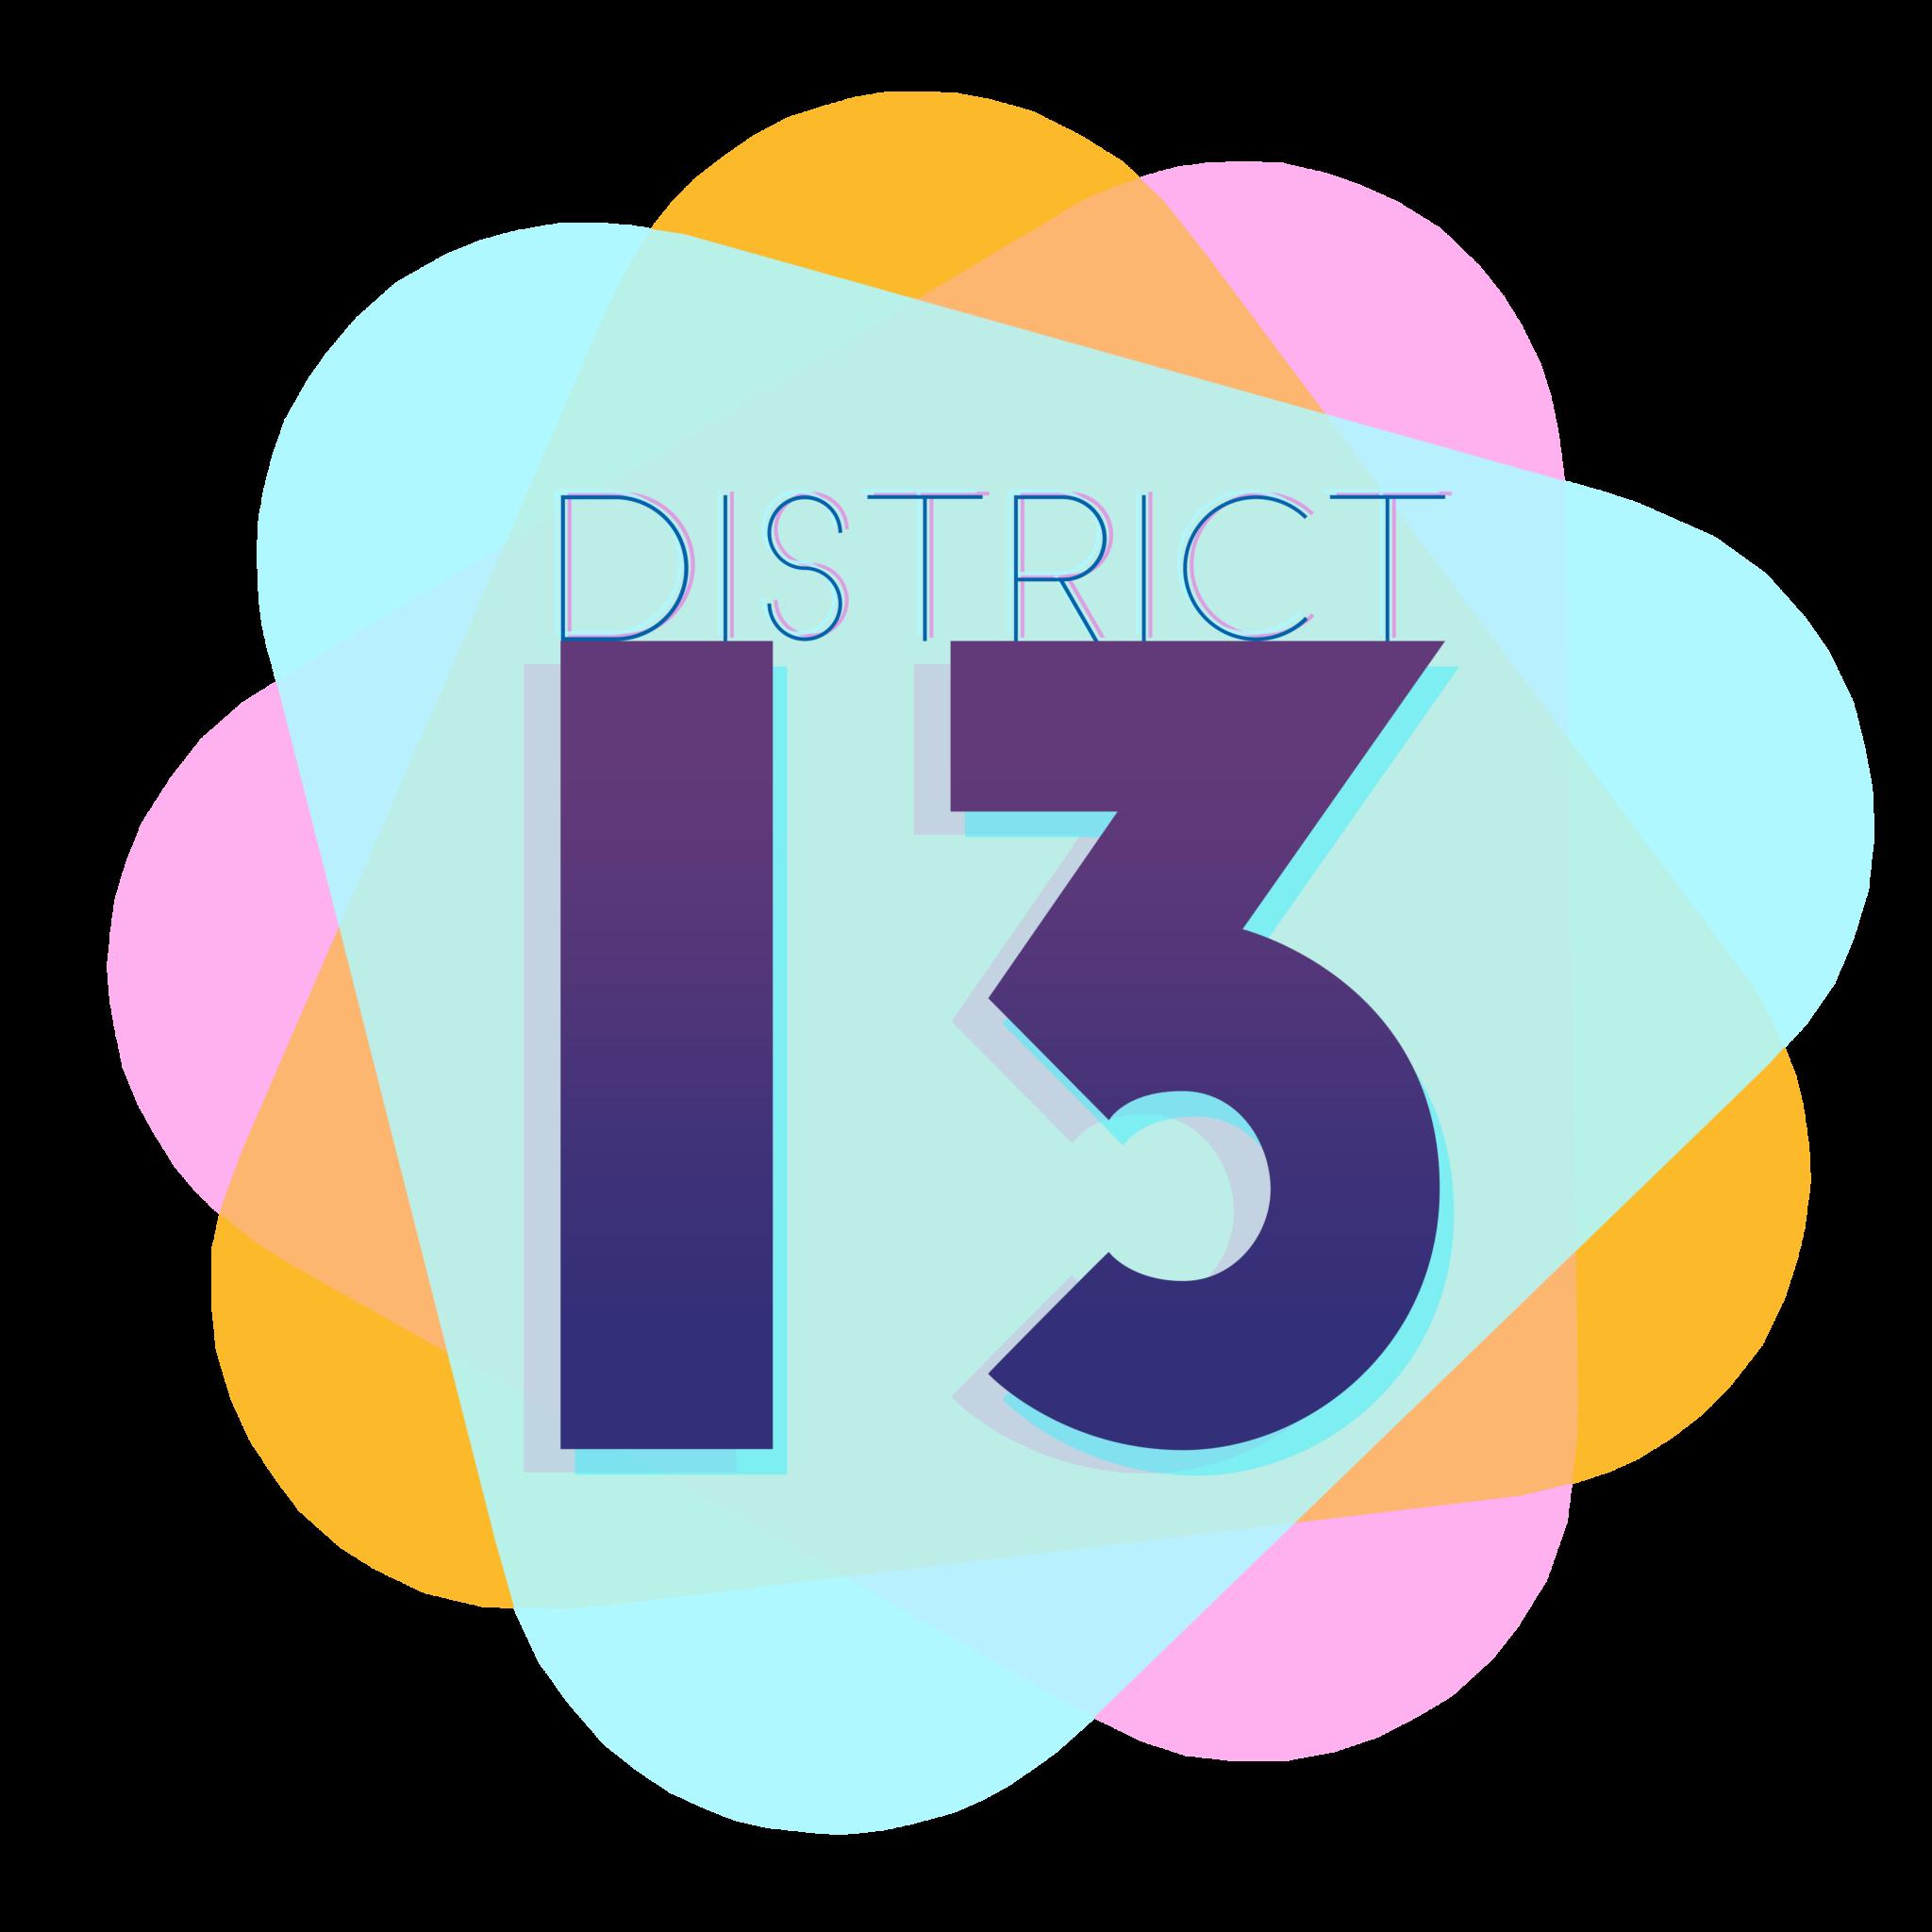 District 13 Thespians